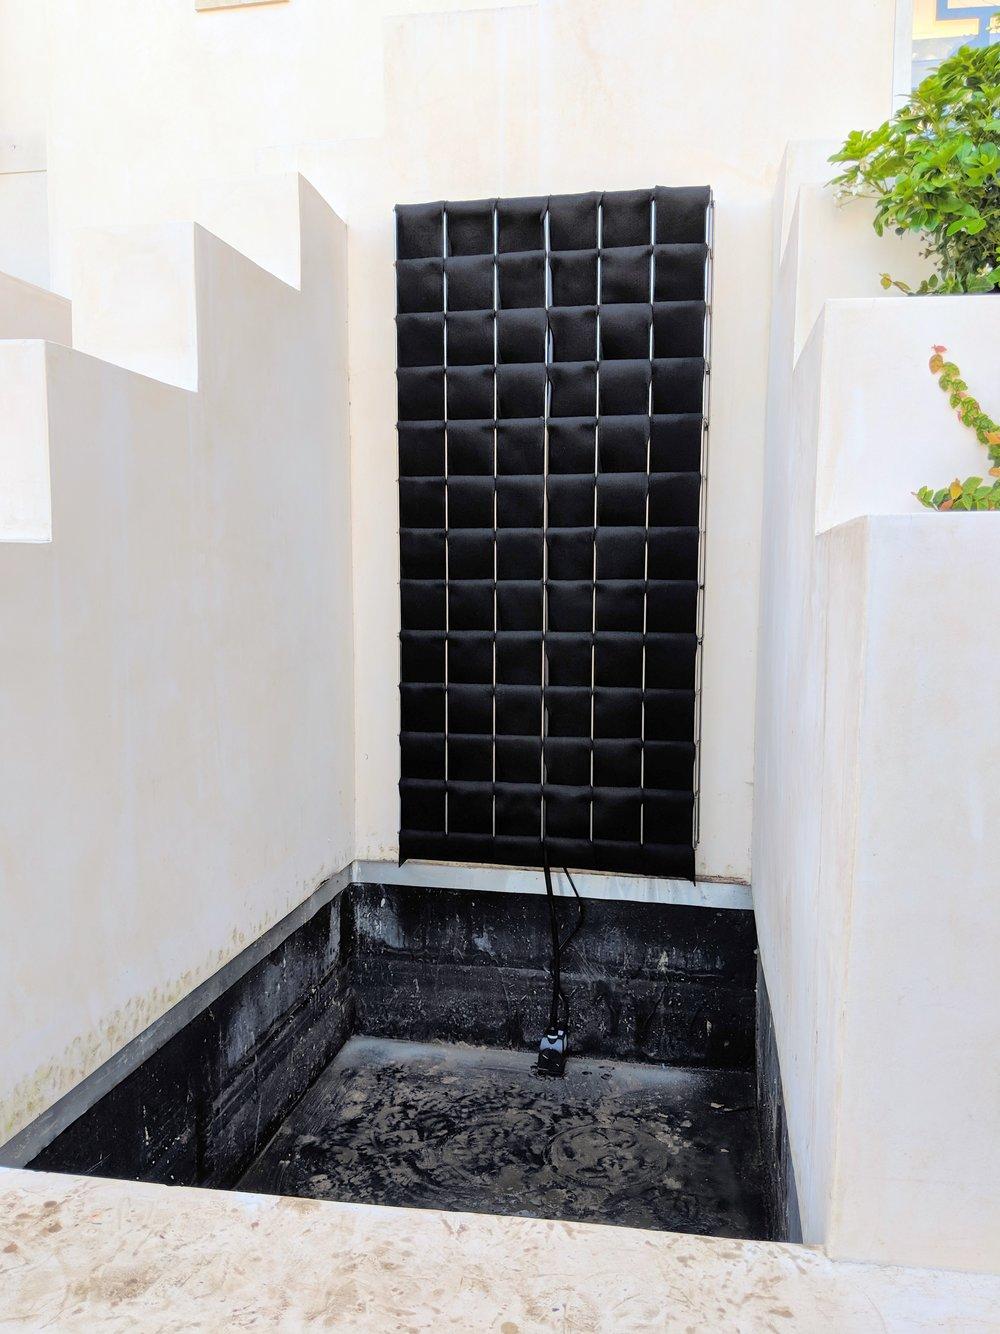 Florafelt Pro System living wall by Lindsey Graves Living Green Design 2.jpg